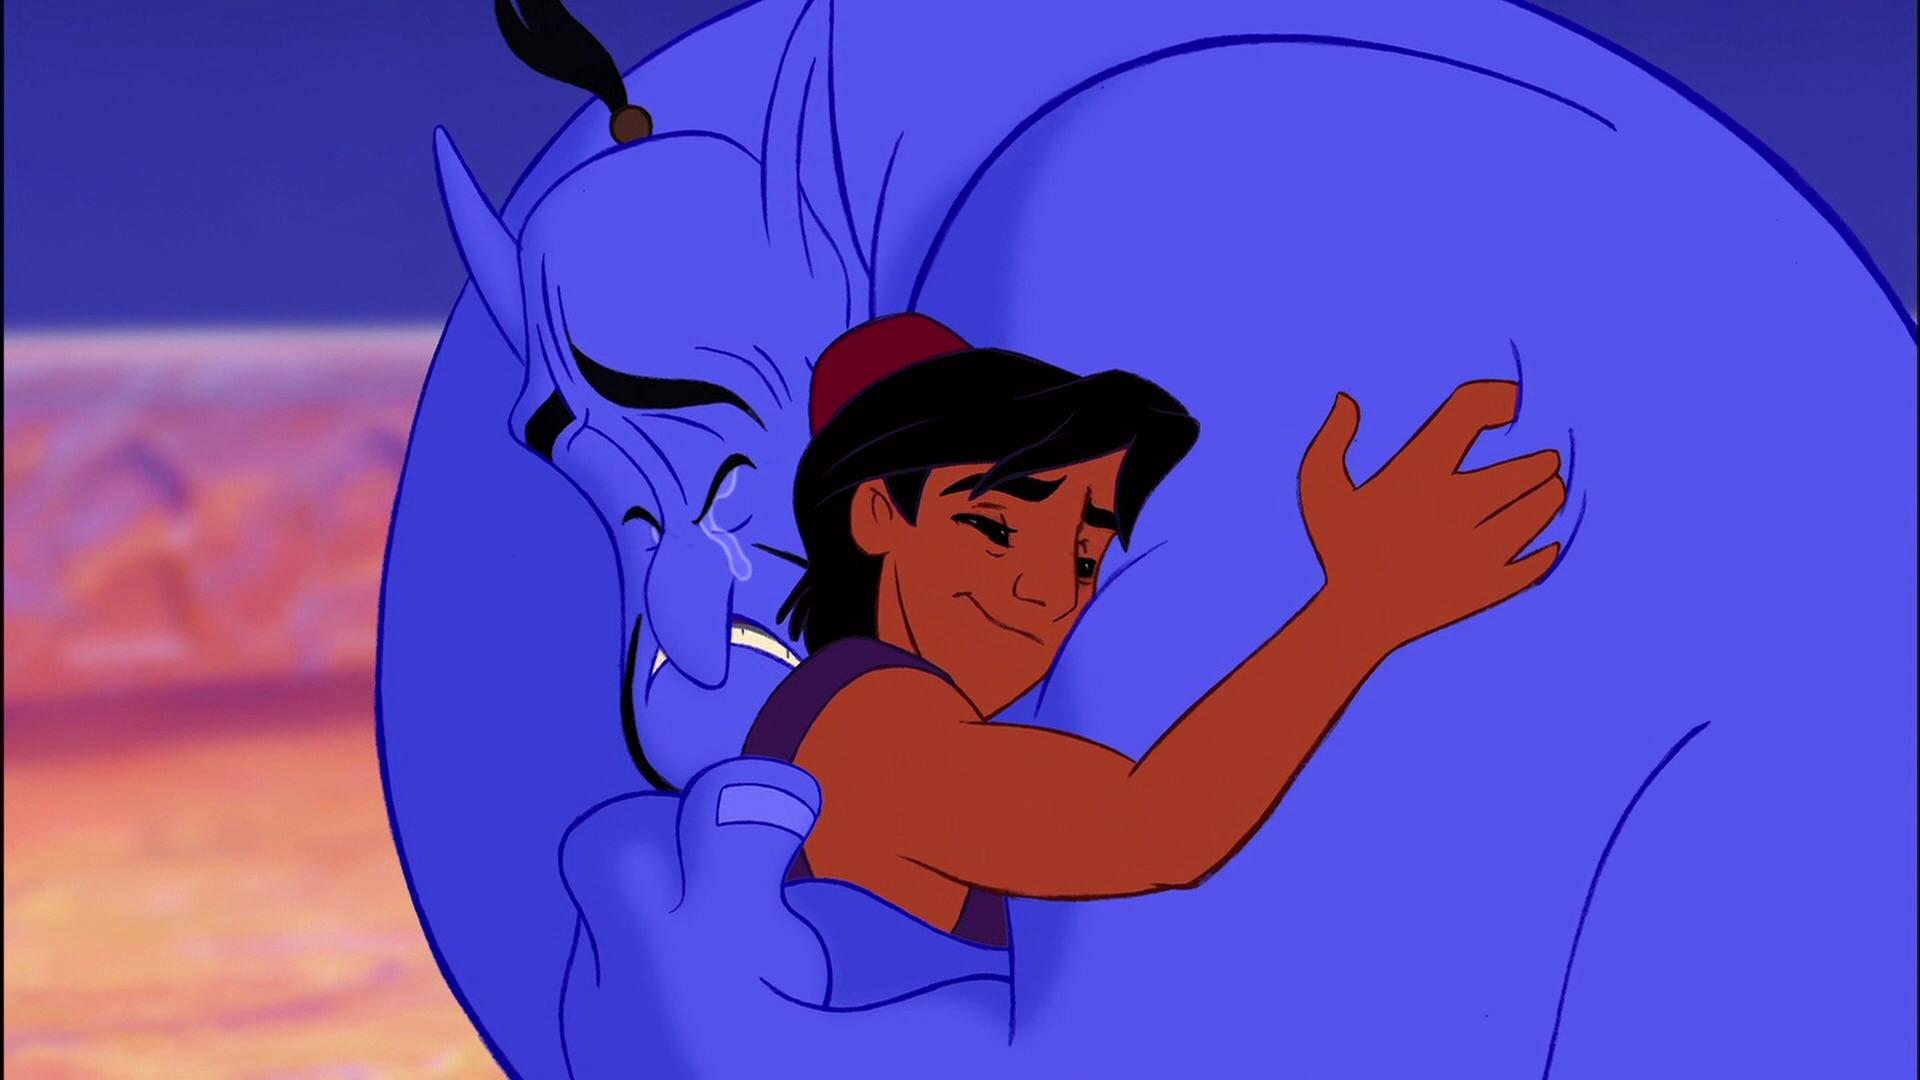 Genie | Disney Wiki | FANDOM powered by Wikia for Aladdin All Characters  55dqh